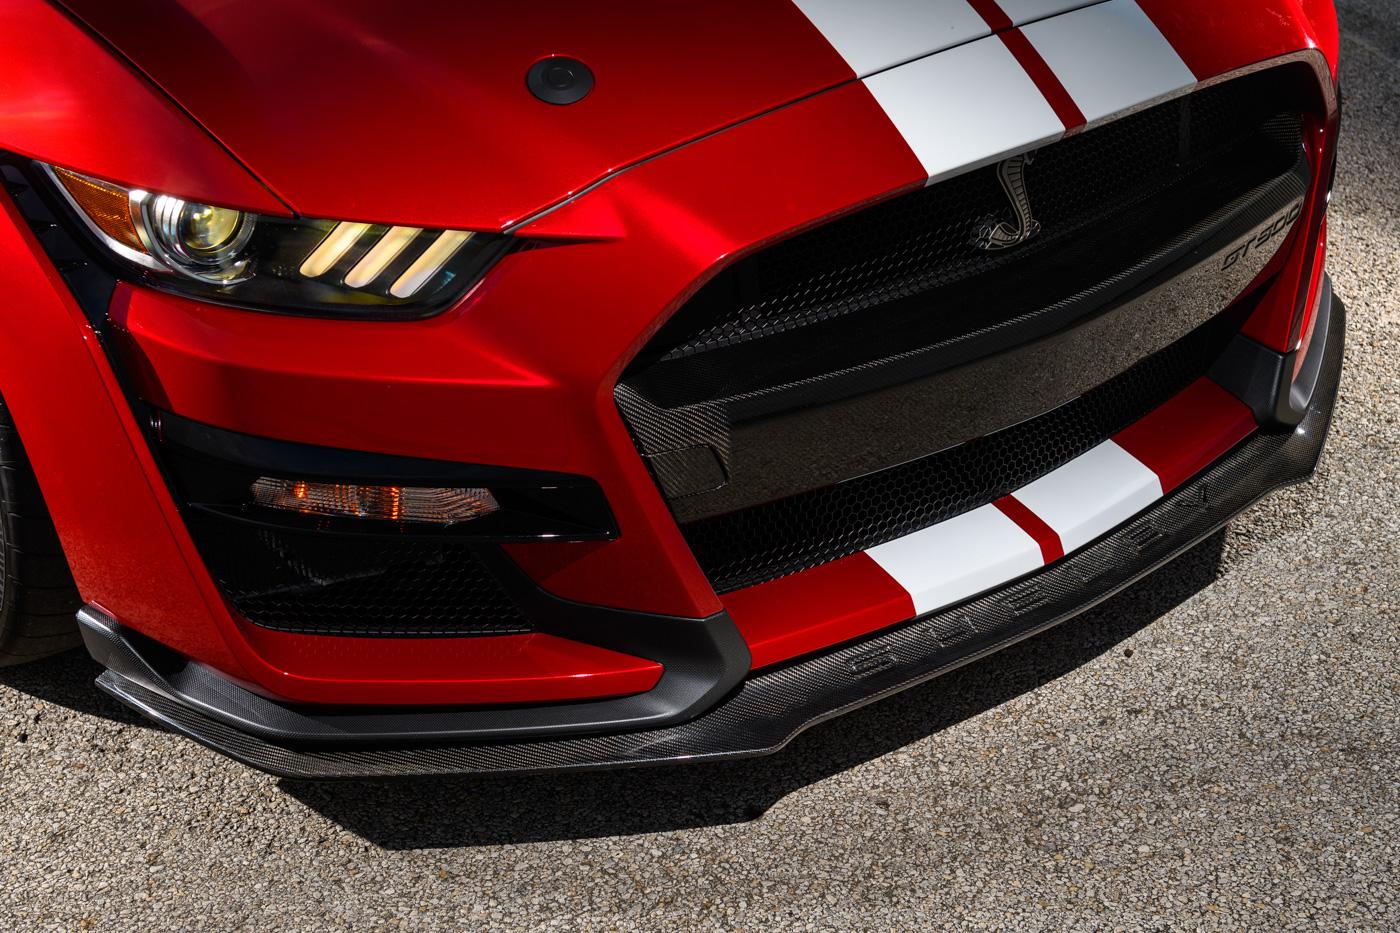 Mustang_GT_500_Carbon_Fiber_Front_Splitter_01.jpg